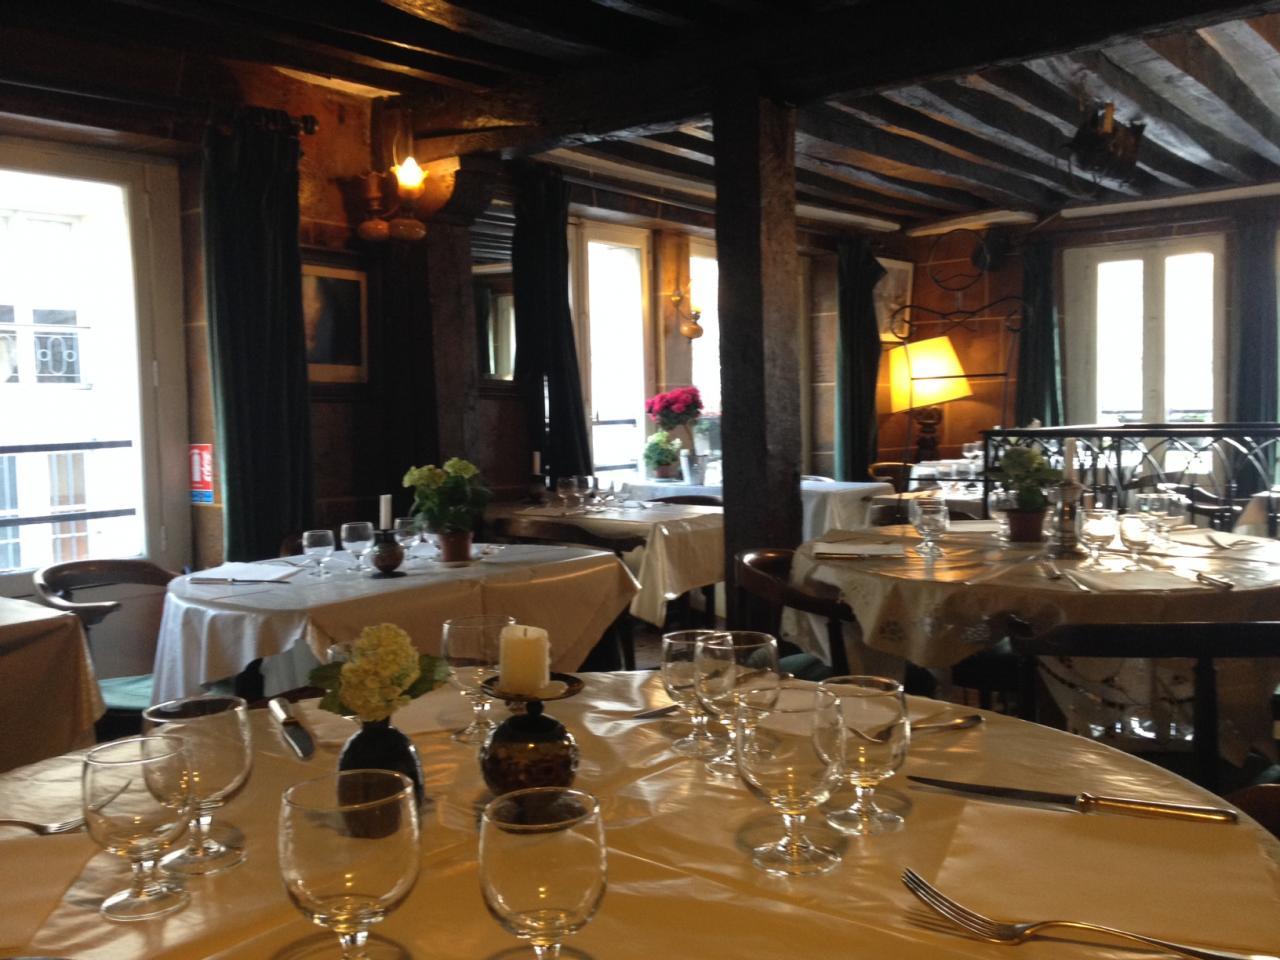 Salle du restaurant au 1er étage